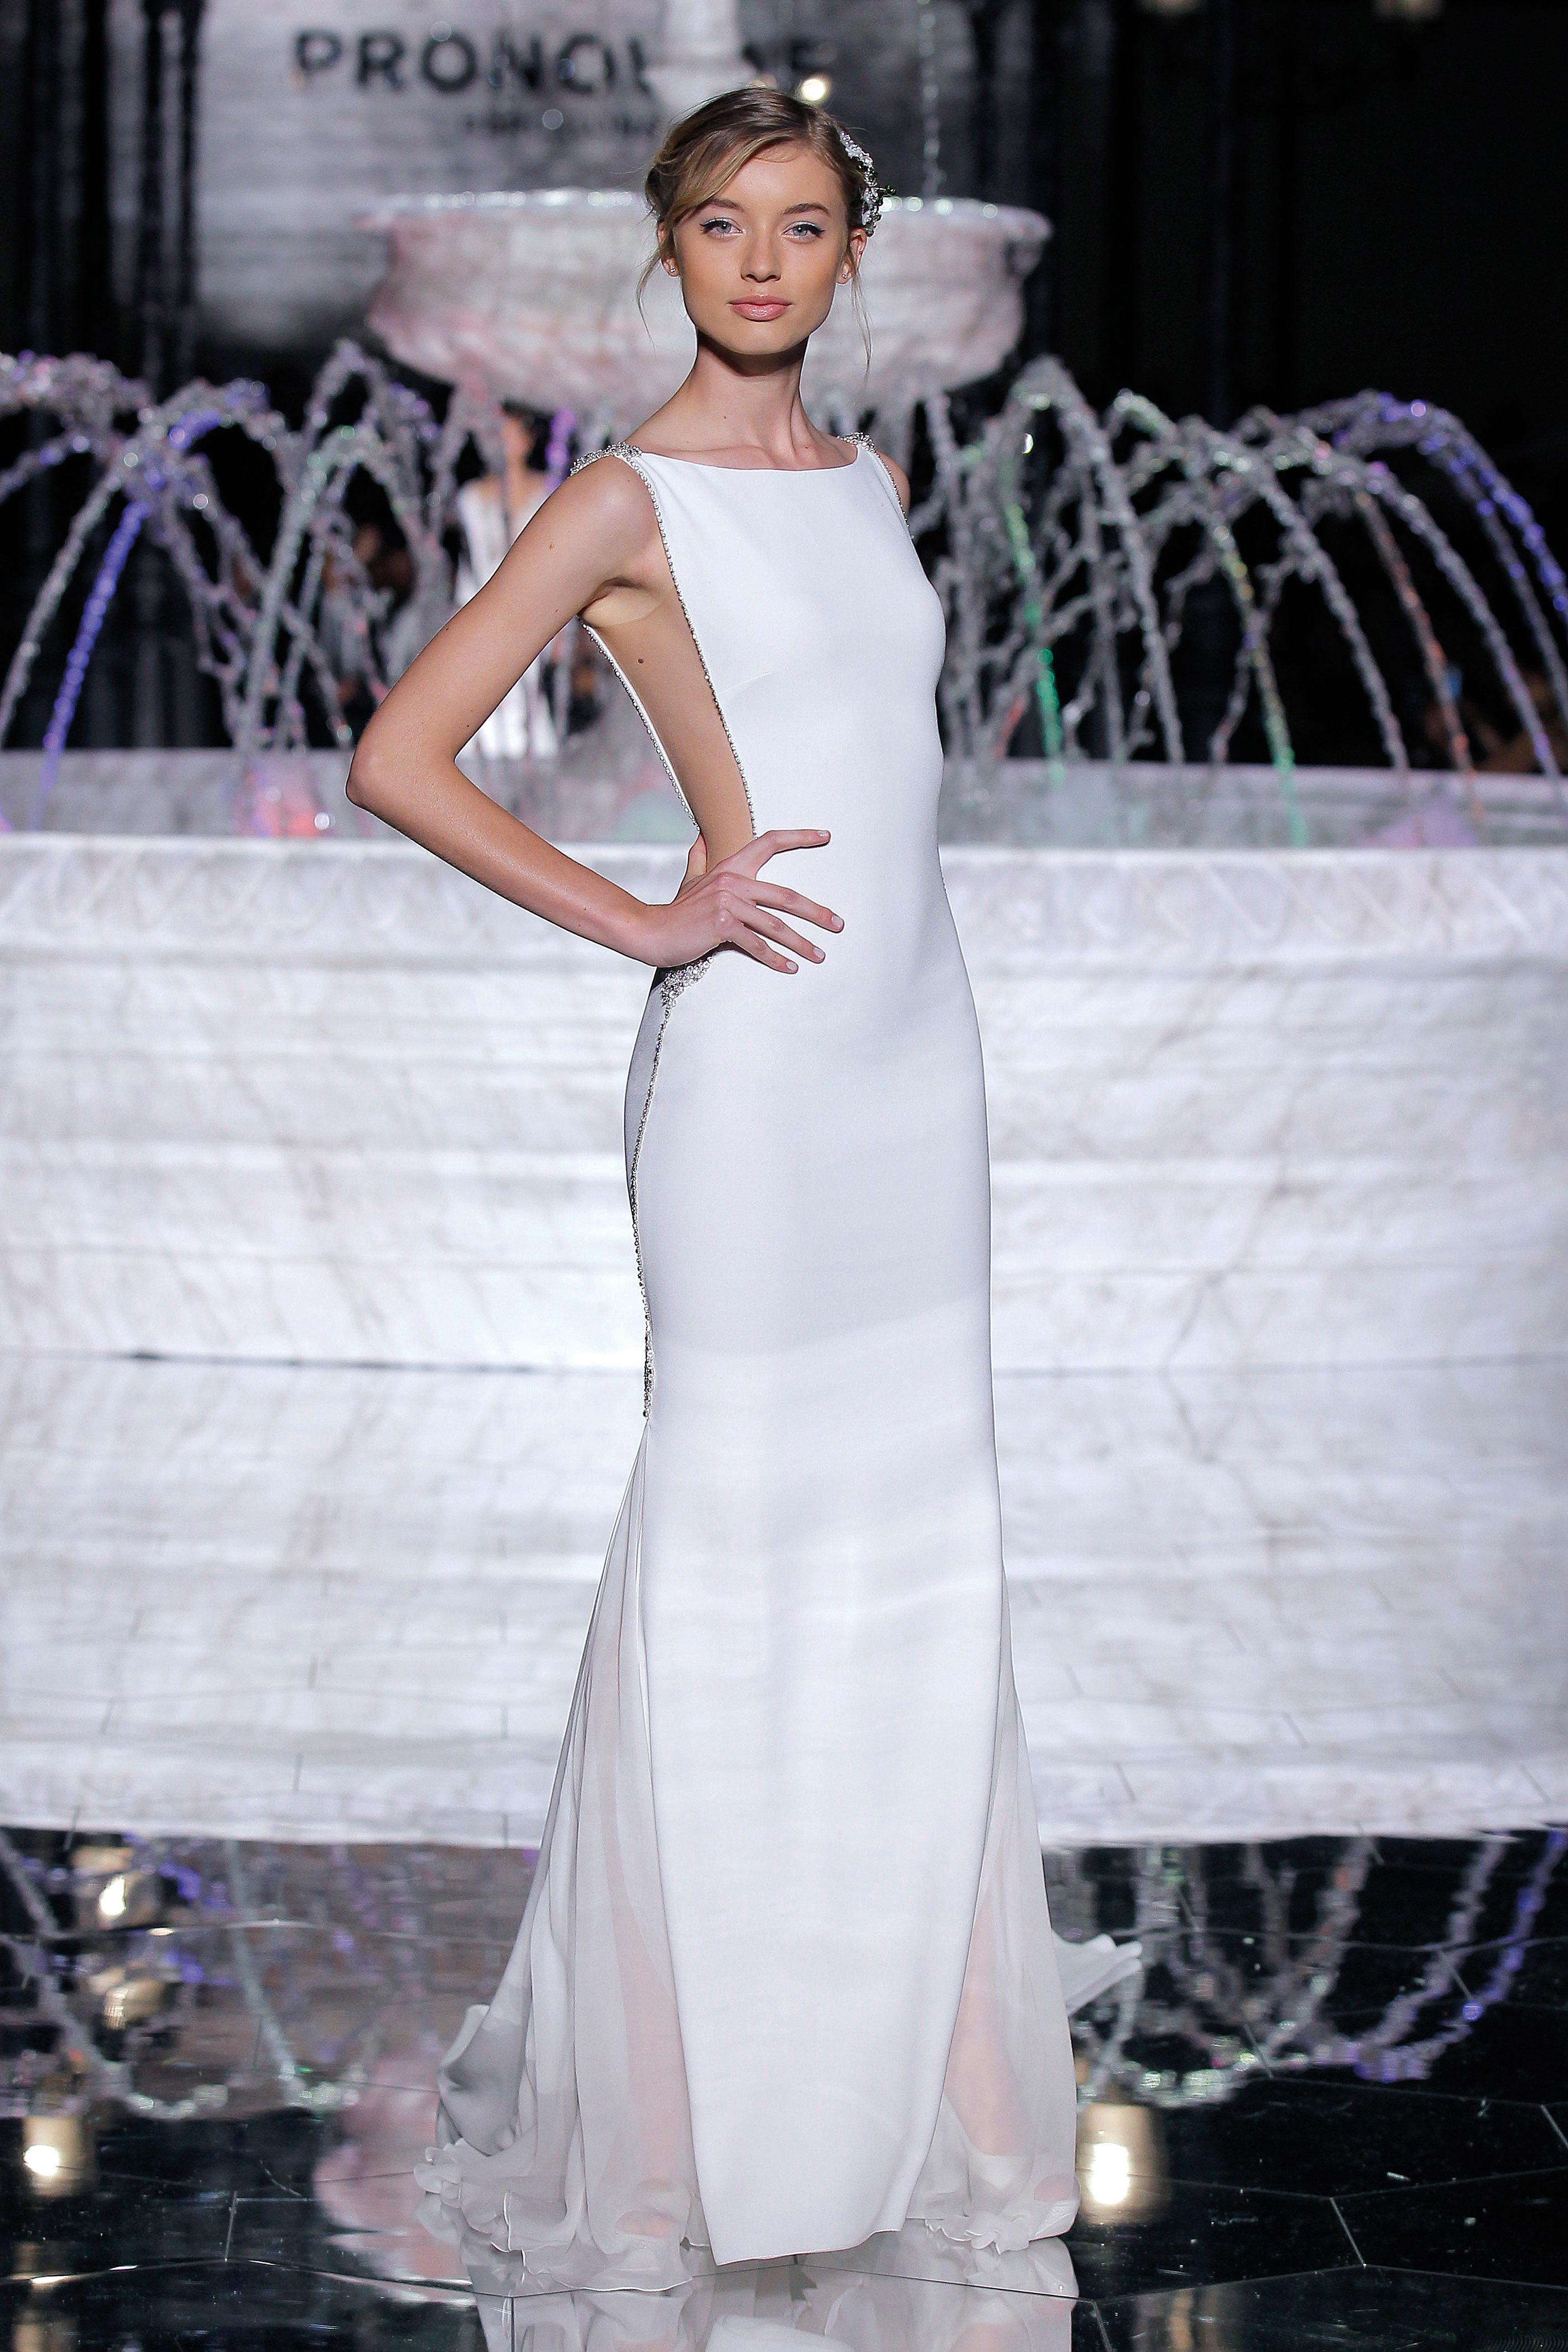 pronovias open-sided sheath wedding dress spring 2018